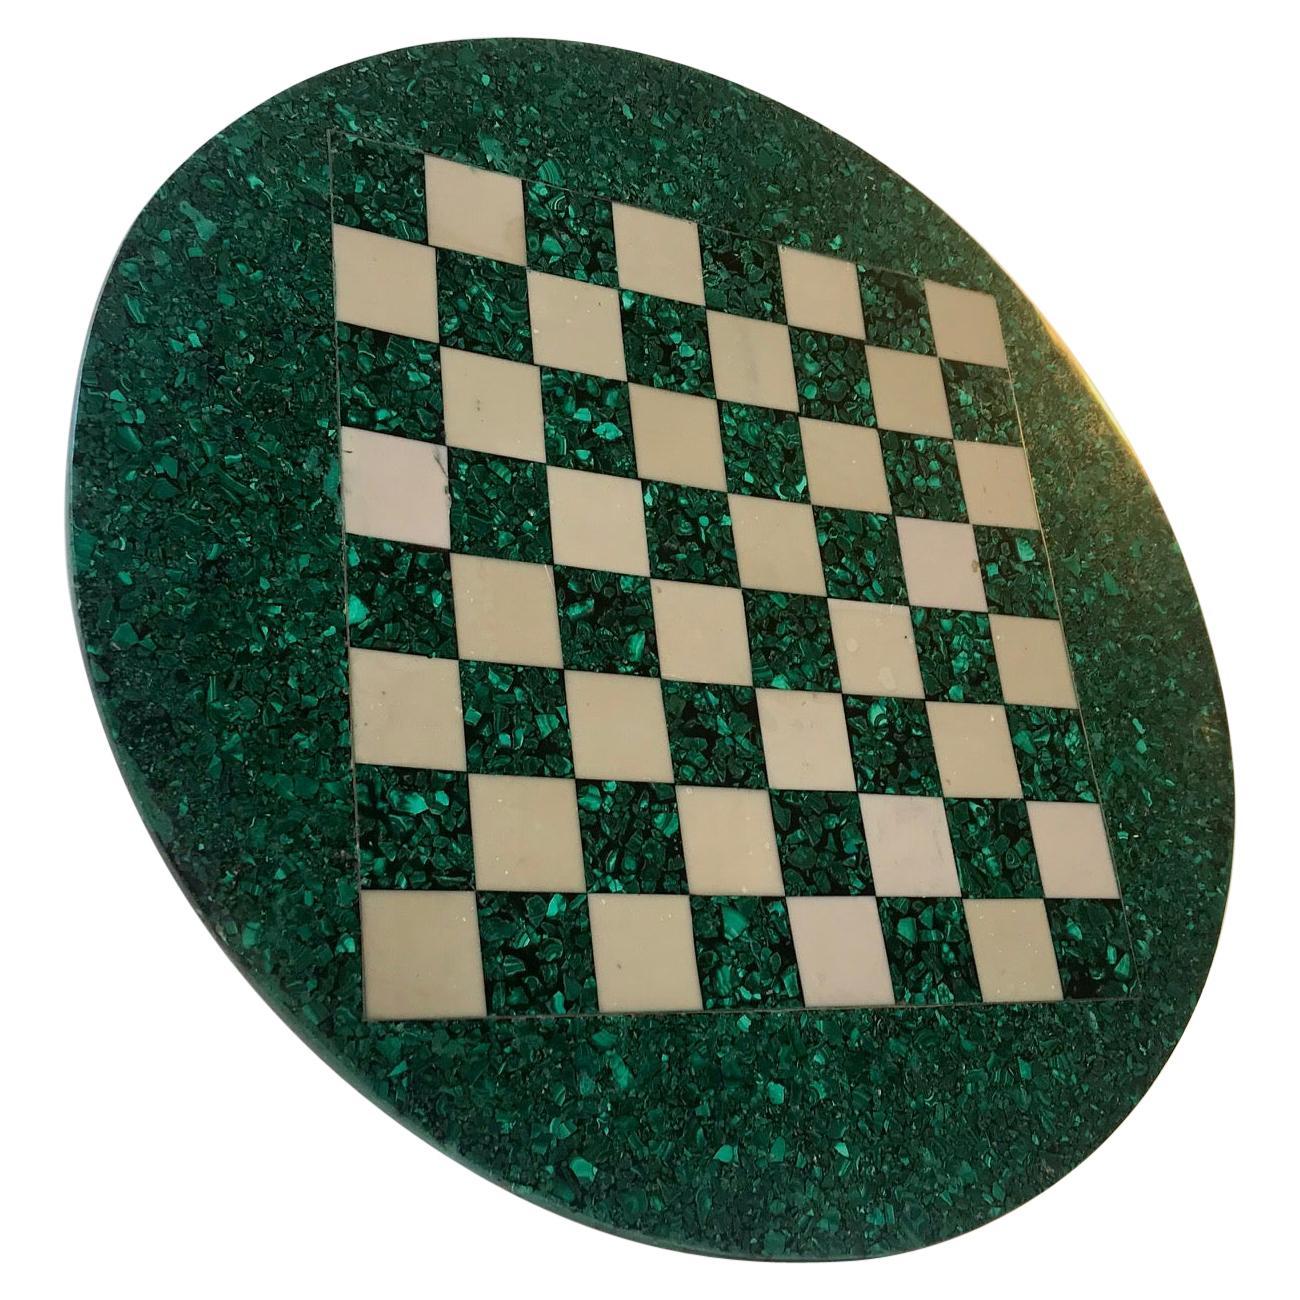 Vintage Italian Malachite and Marple Chess Board, 1970s